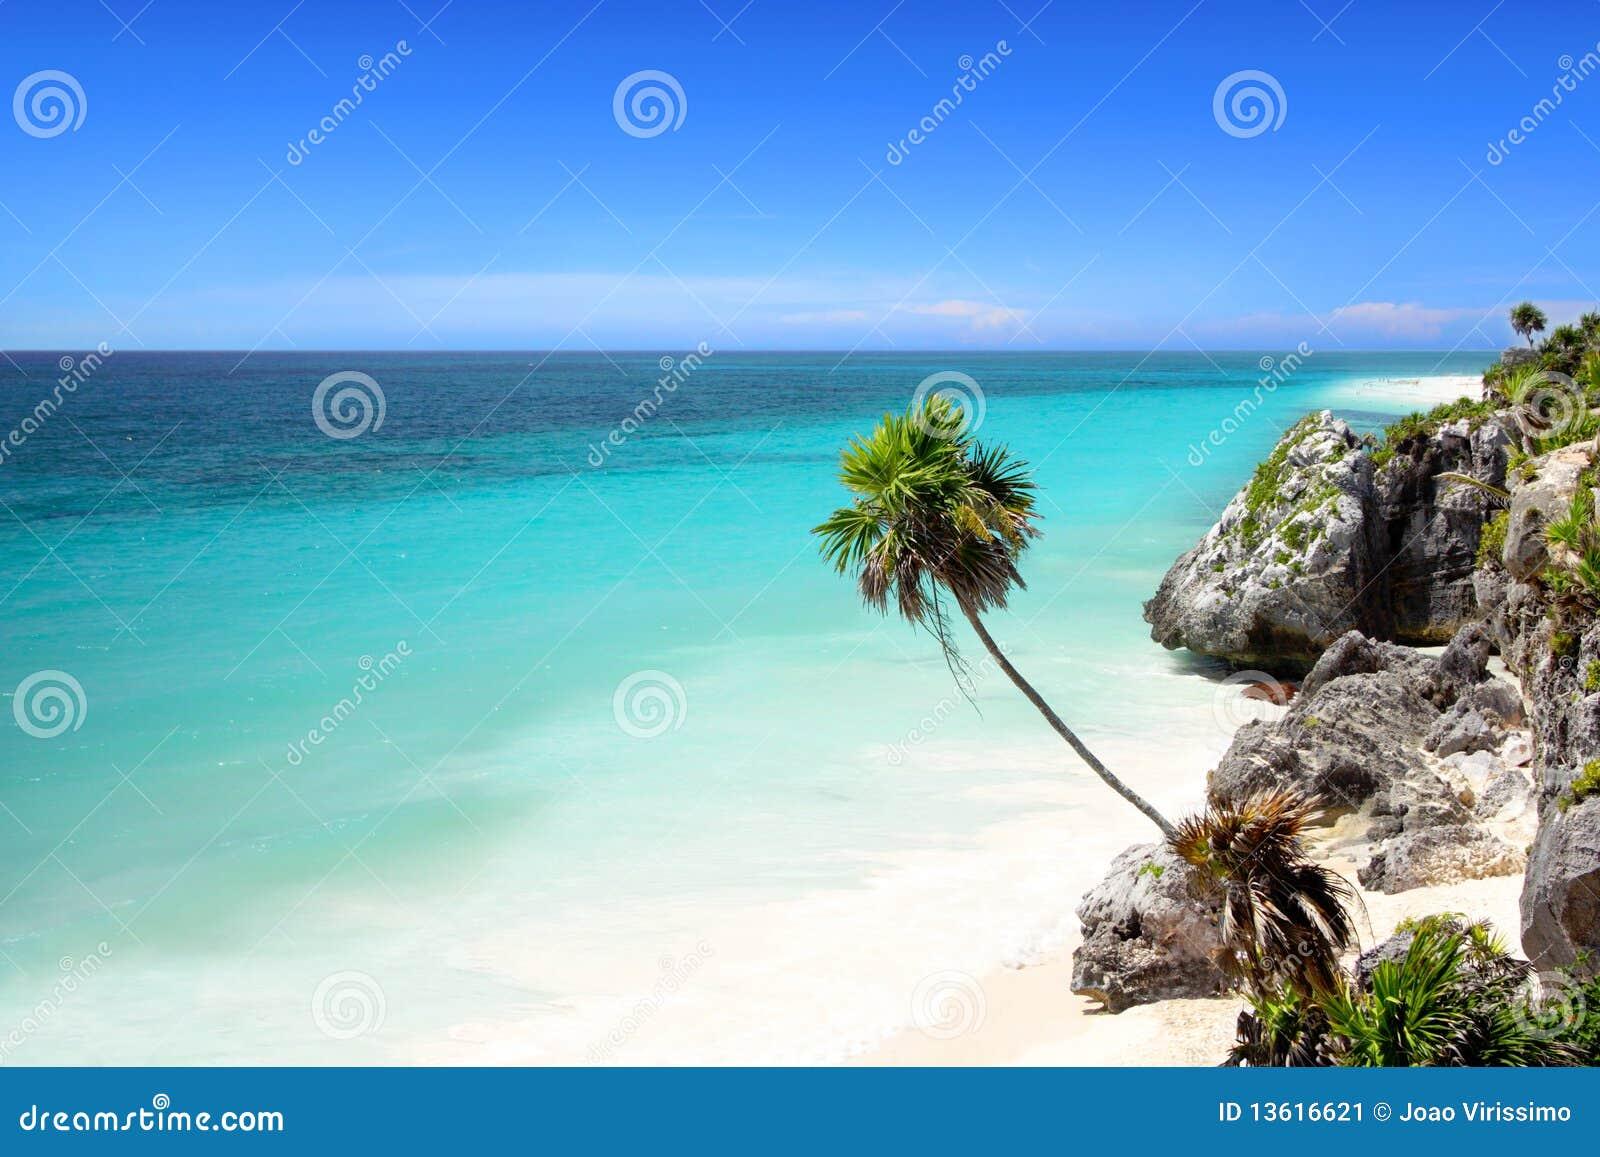 Tulum beach near Cancun, Mayan Riviera, Mexico